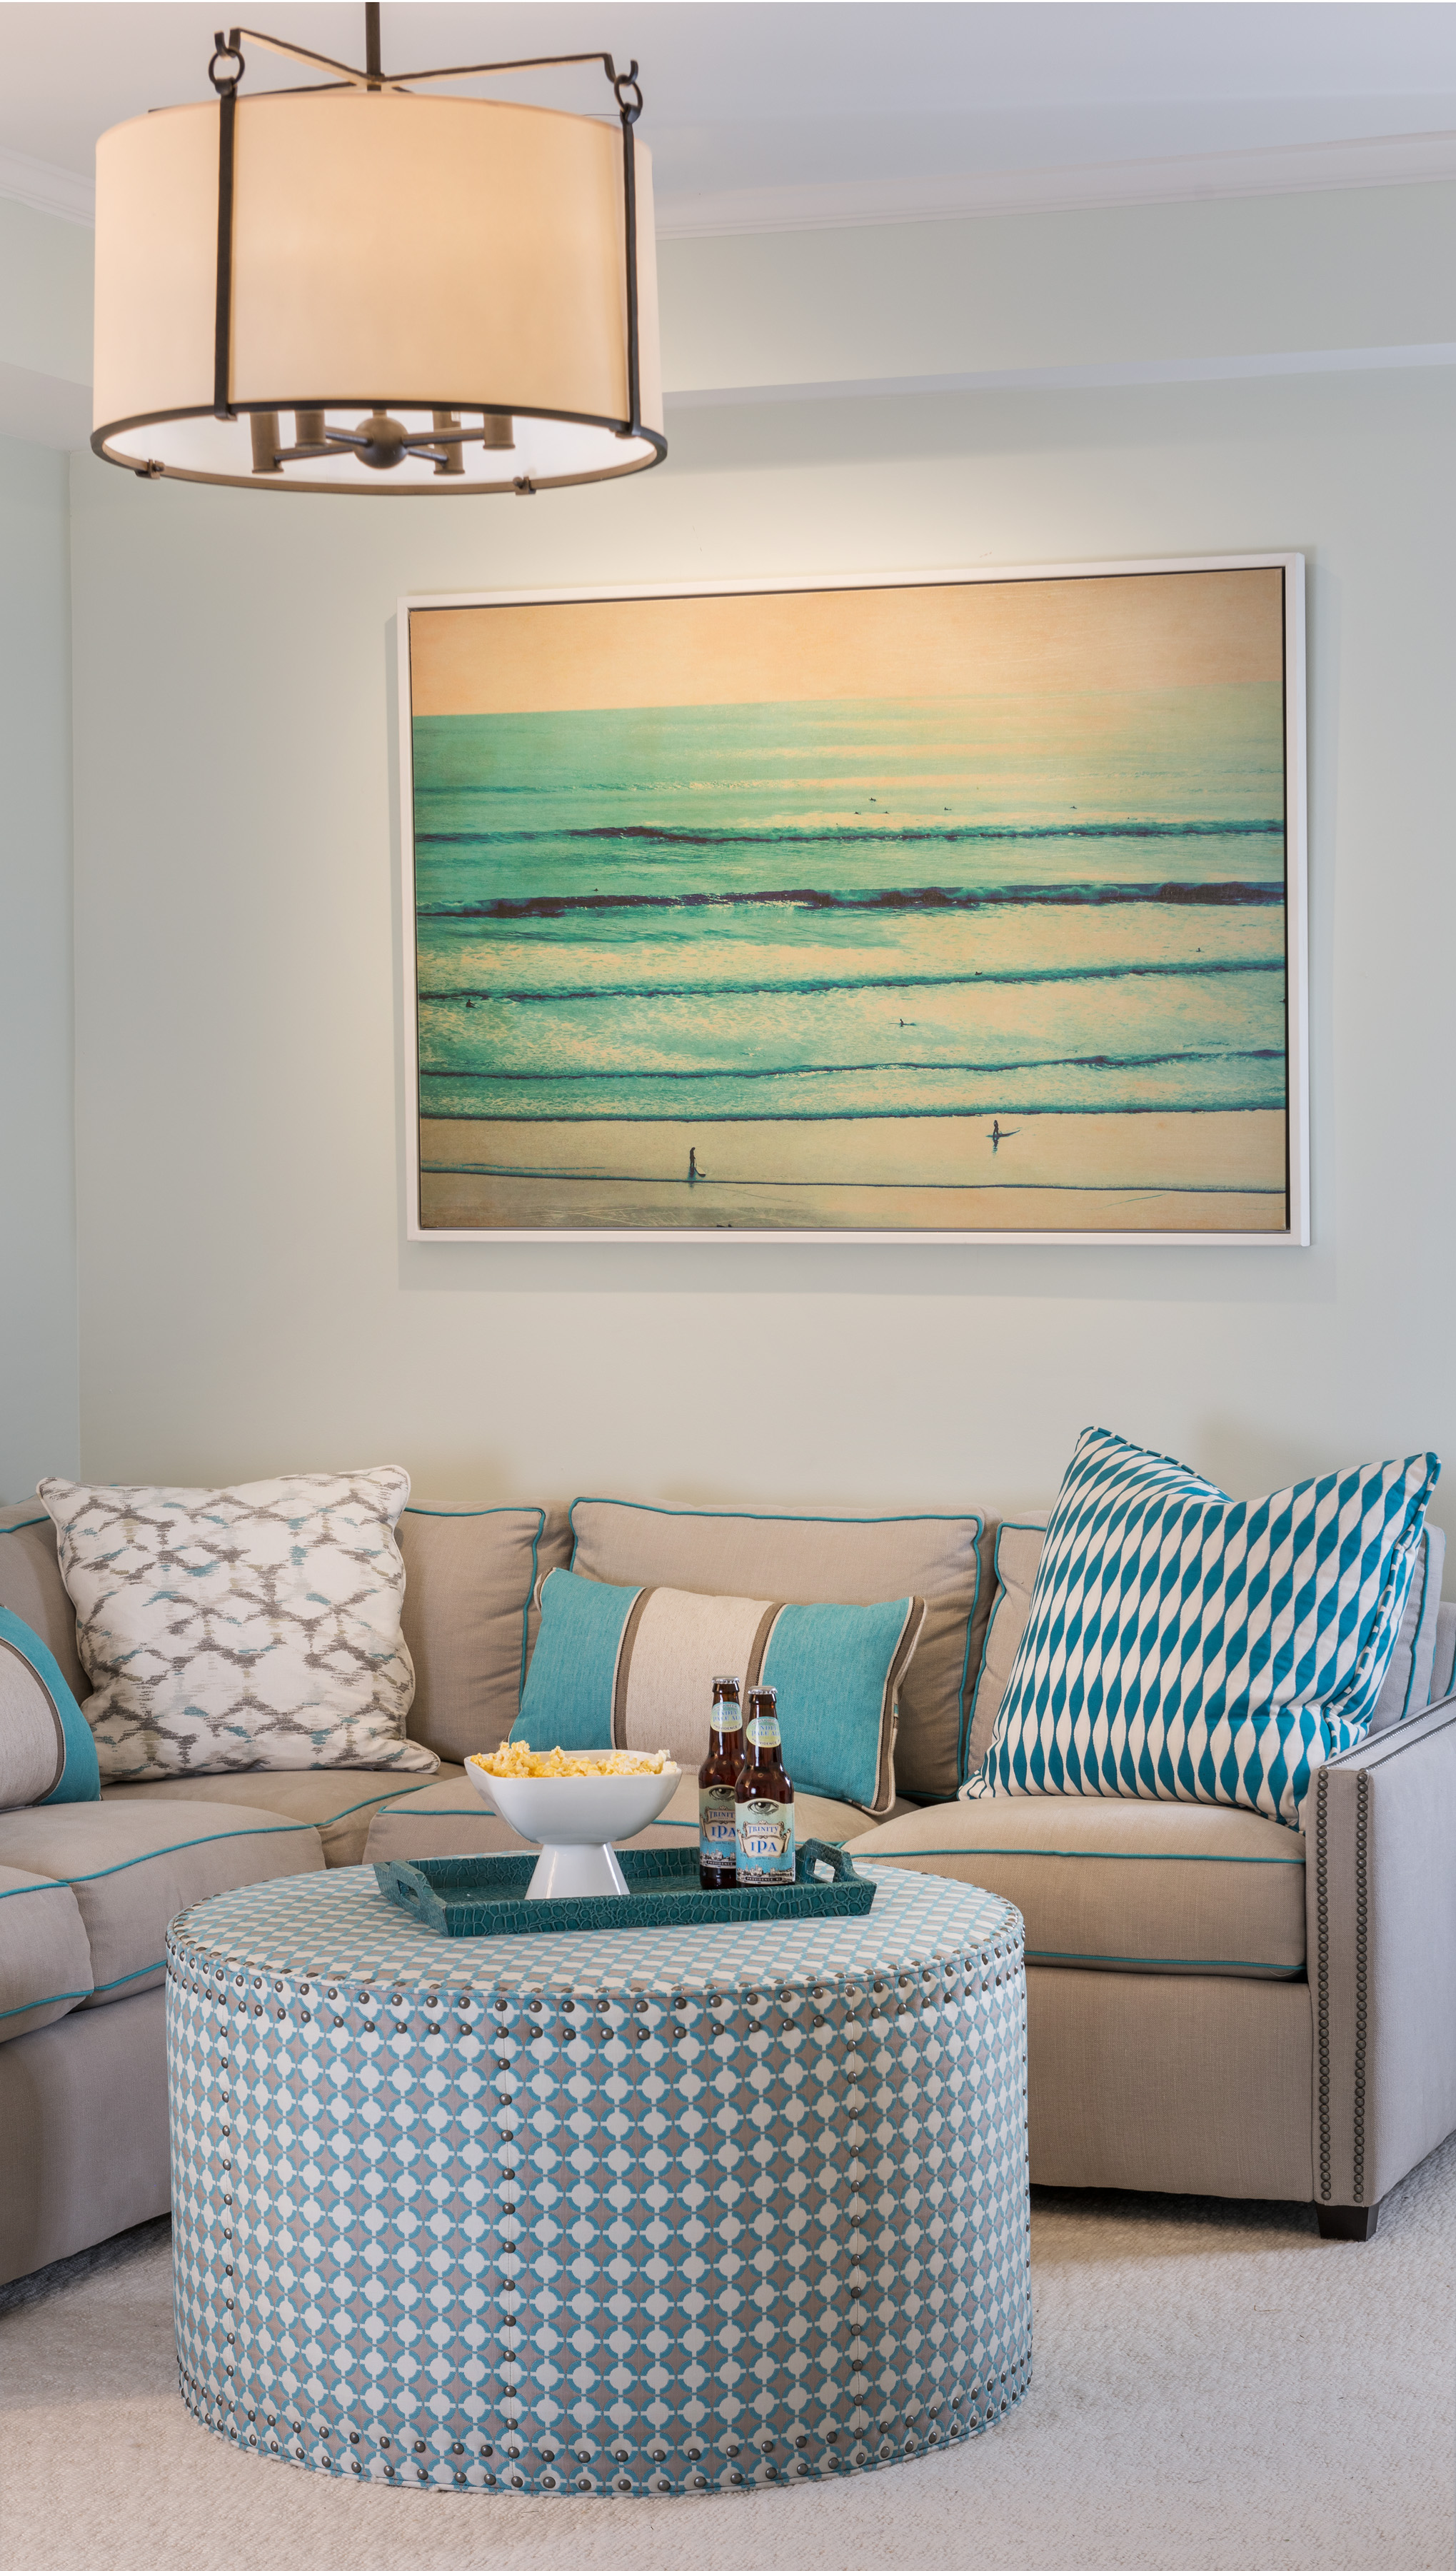 Easton's Beach, Newport, Rhode Island, interior design, beach design, beach print, turquoise blue, aqua blue, living space